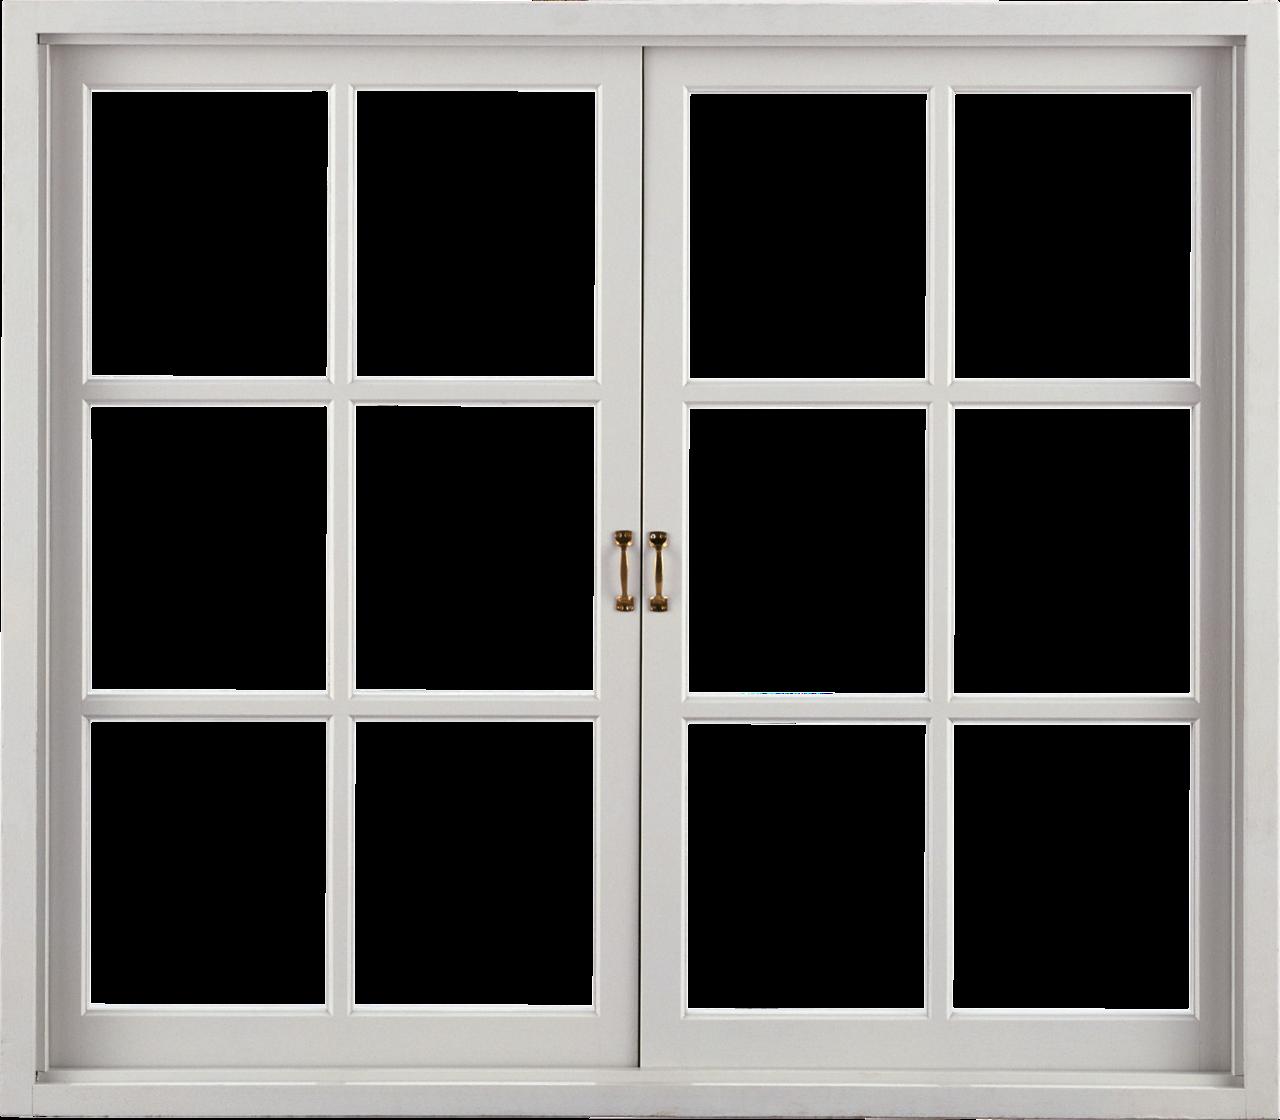 Window PNG Image PurePNG Free transparent CC0 PNG